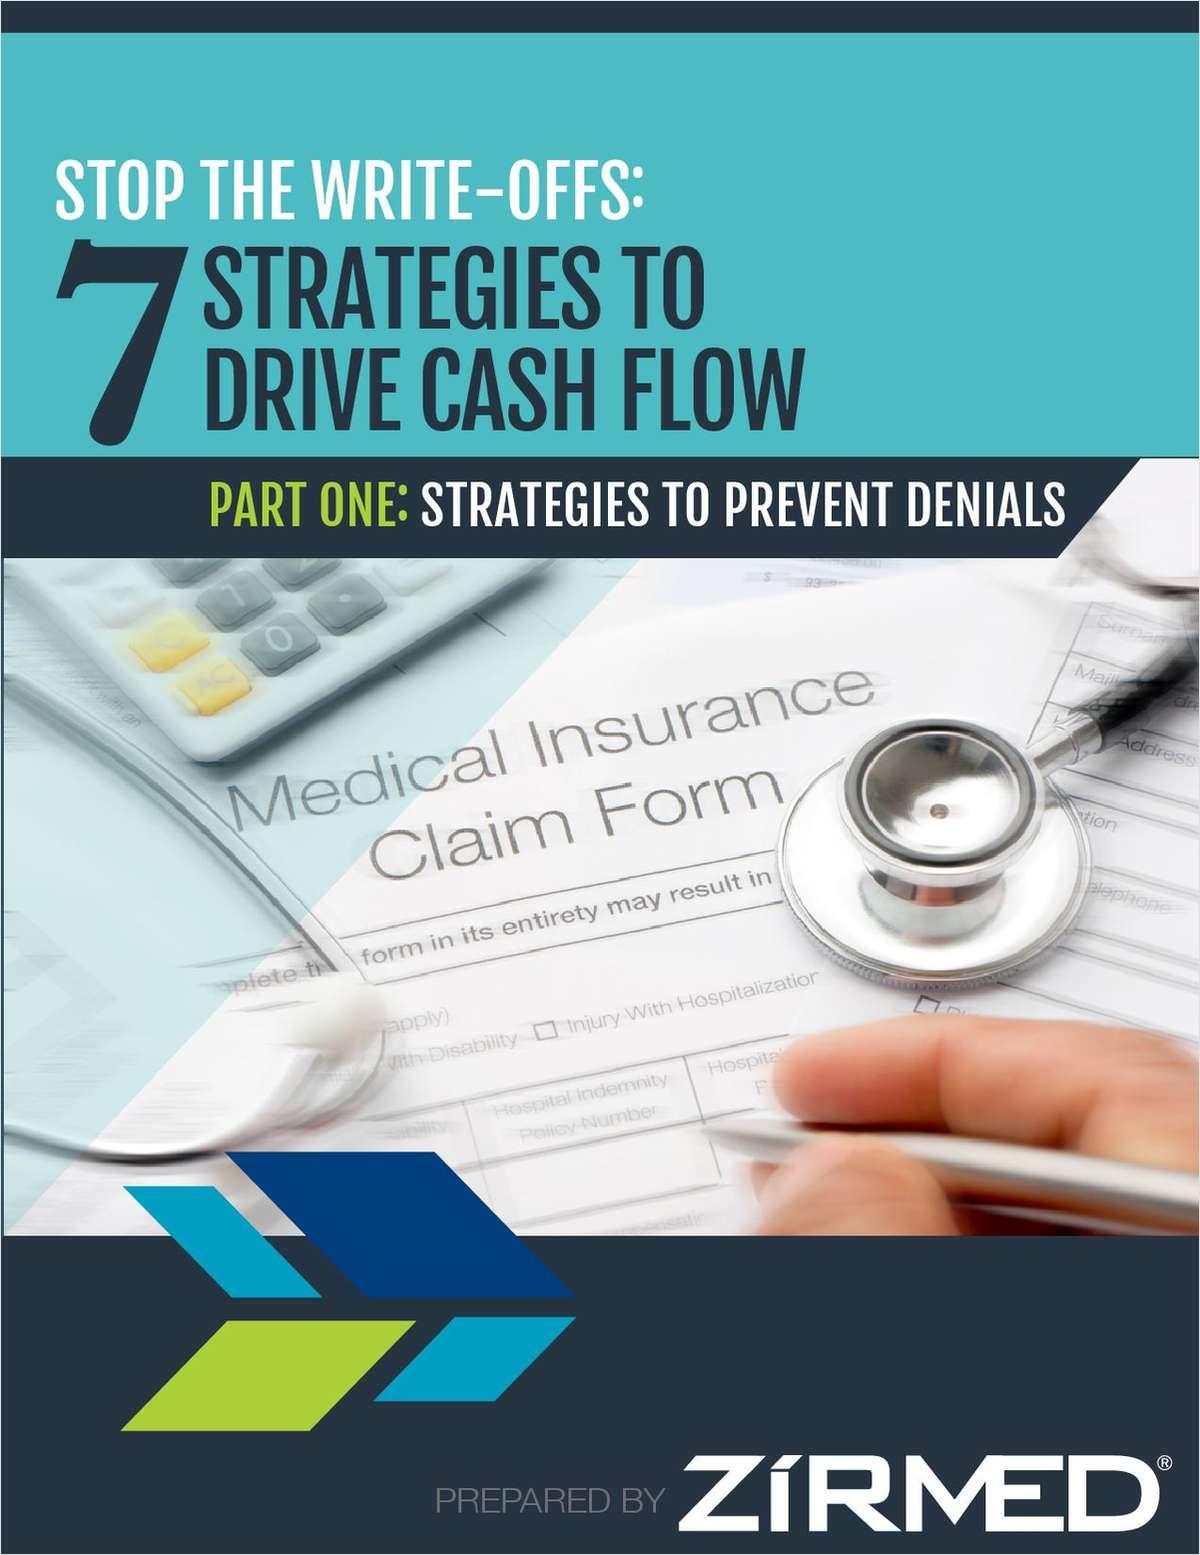 7 Strategies to Drive Cashflow